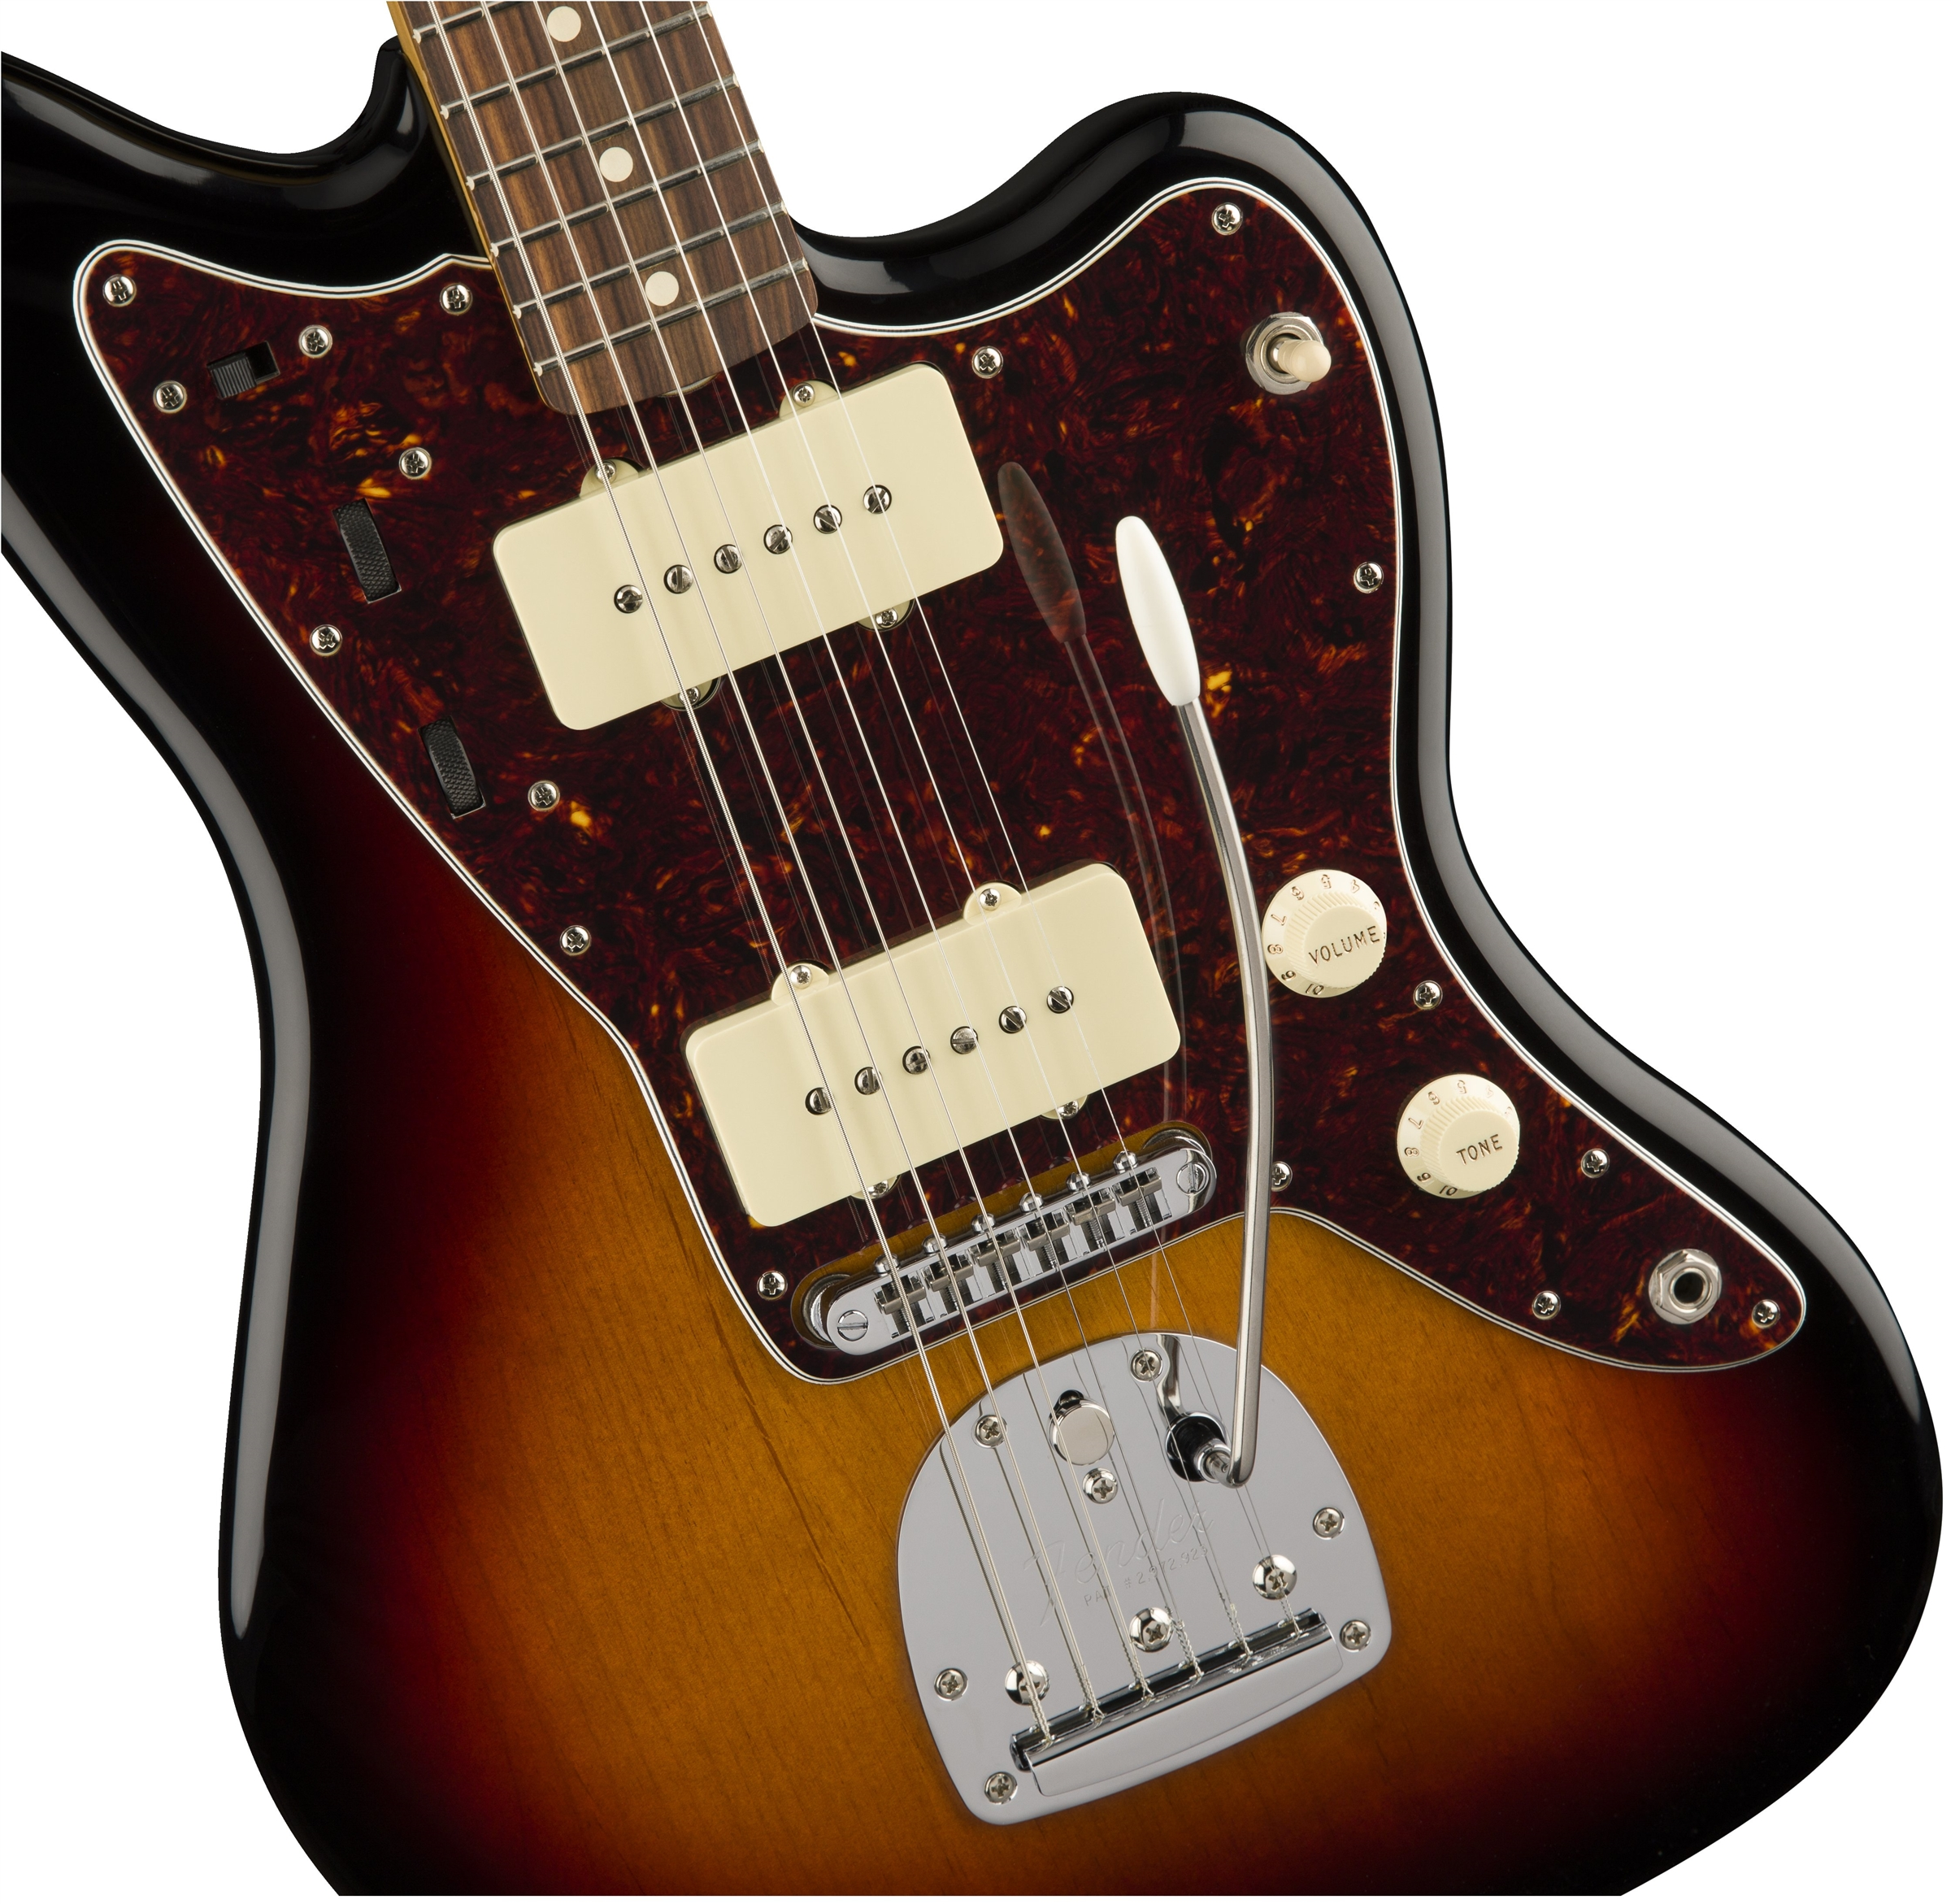 121 Jazzmaster Fender Guitar Wiring Diagrams | Wiring Resources on fender jazz bass guitar wiring diagrams, acme guitar wiring diagrams, jazzmaster pickup wiring, fender stratocaster guitar wiring diagrams,